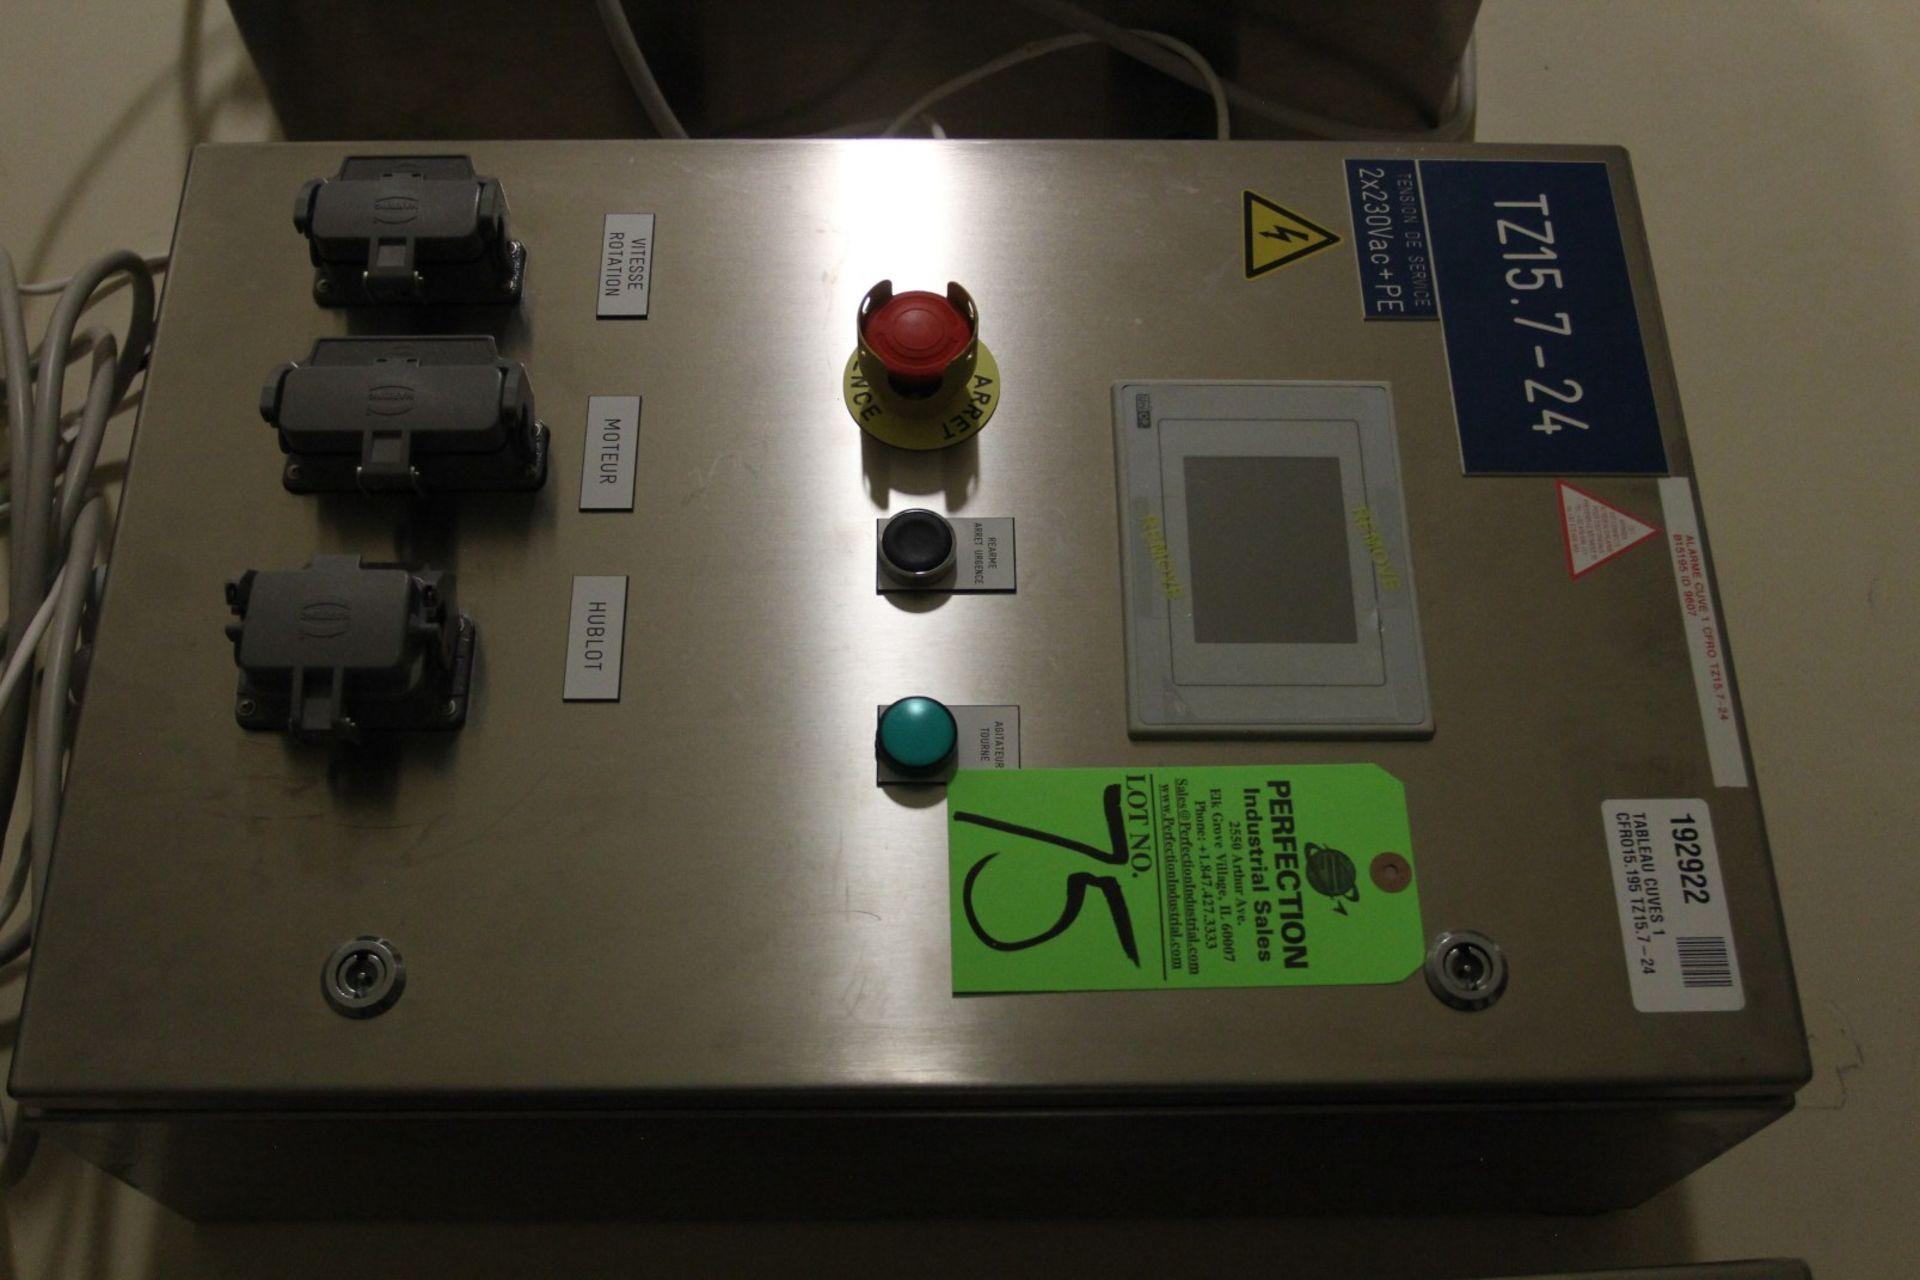 Lot 75 - Siabt UniOp PLC Control for Vessel